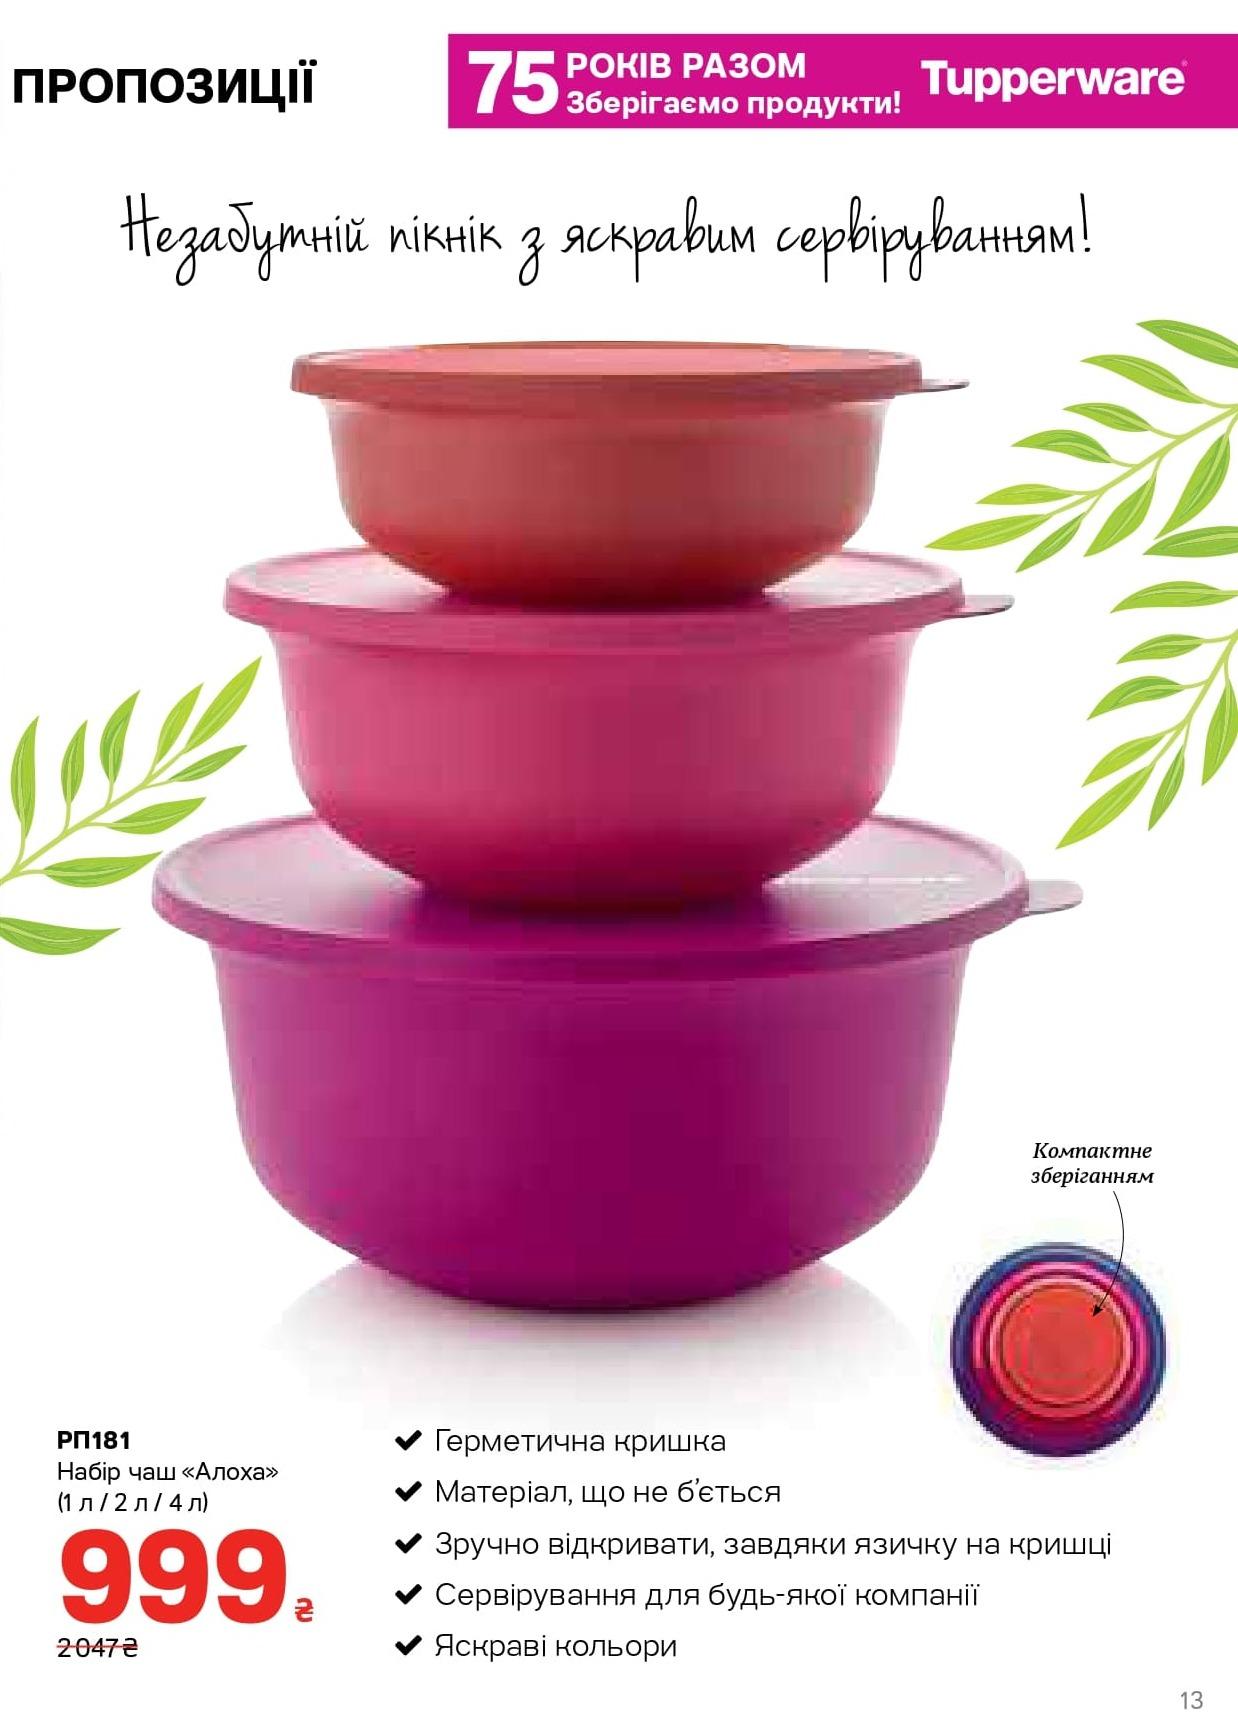 Набор чаш алоха Tupperware, объем 1, 2 и 4 литра.